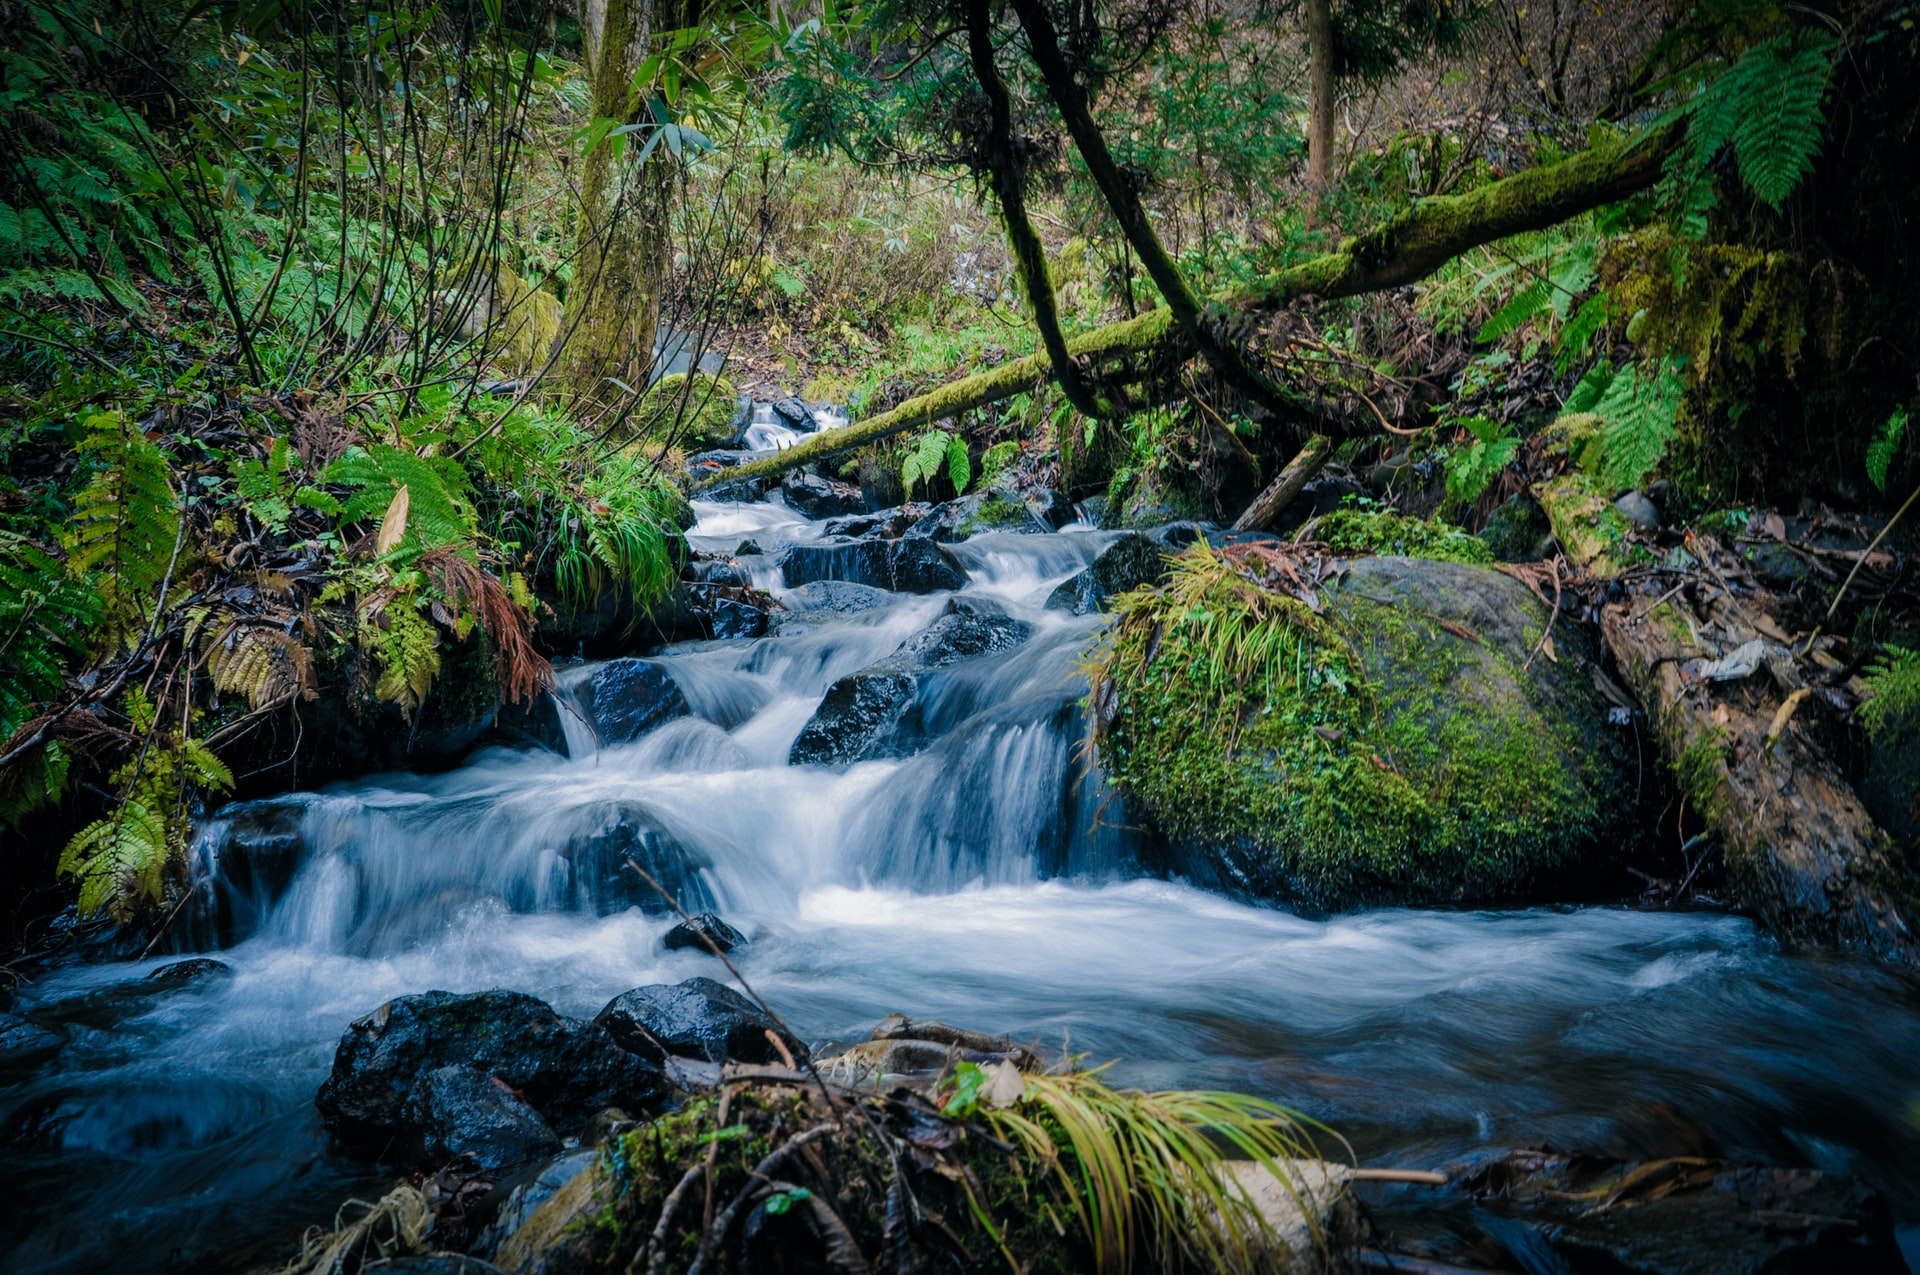 Small waterfall with greenery surrounding it